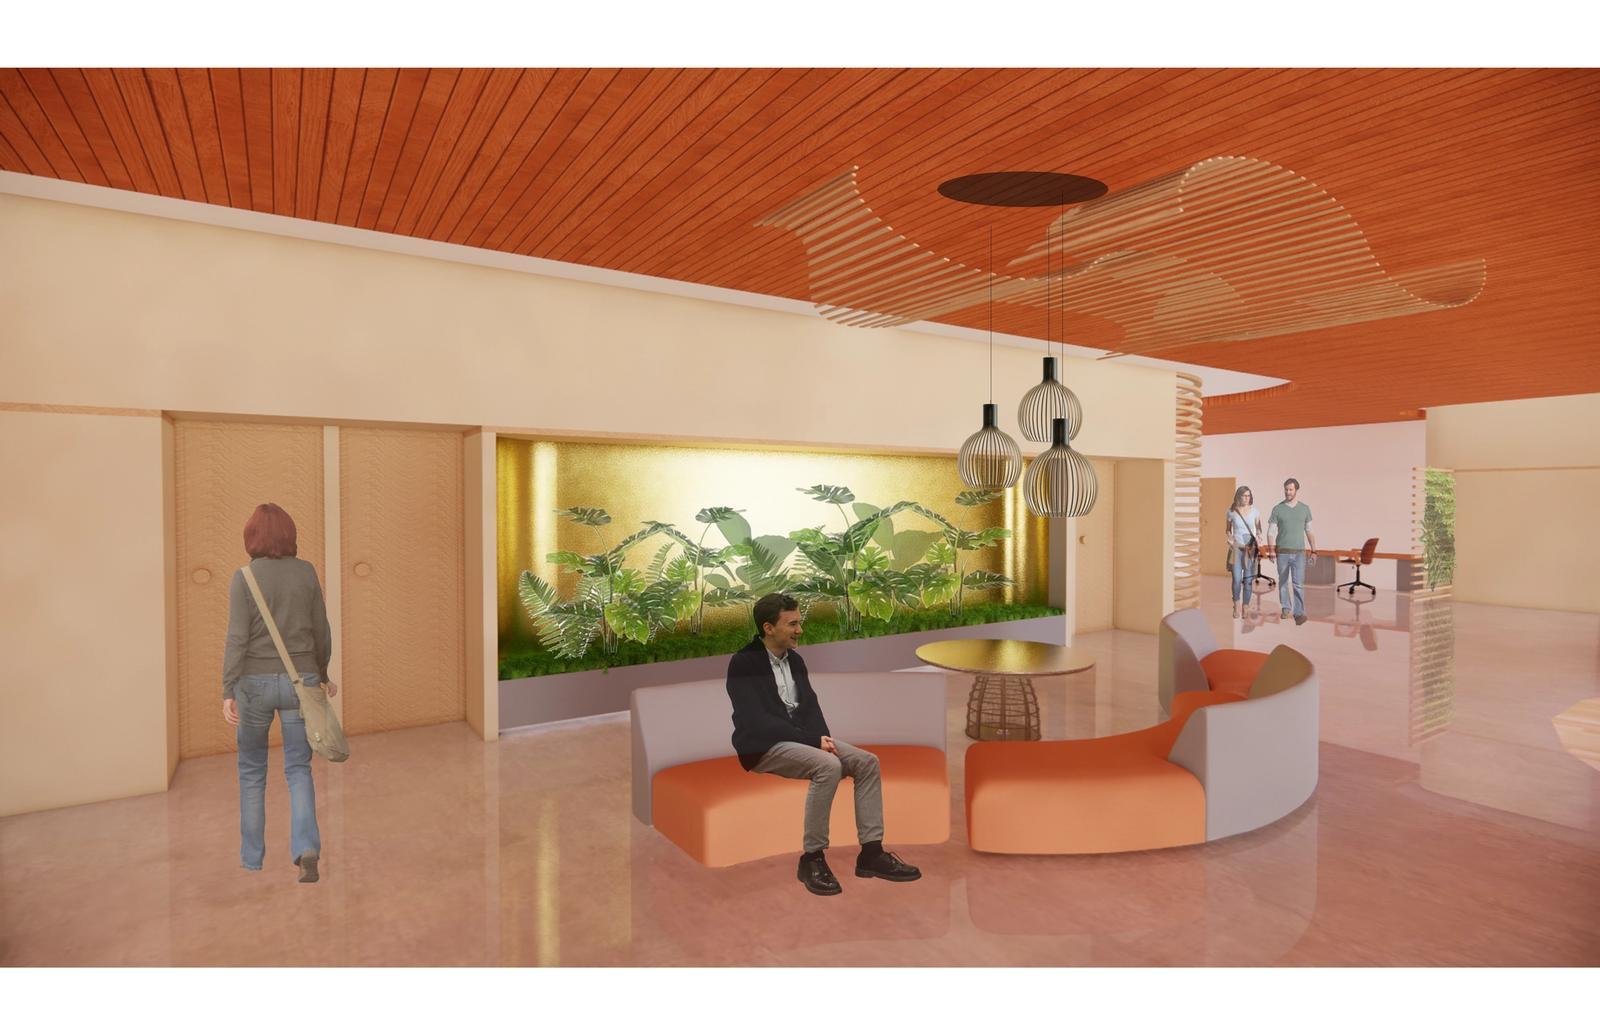 Community Centre Design - Student Lounge